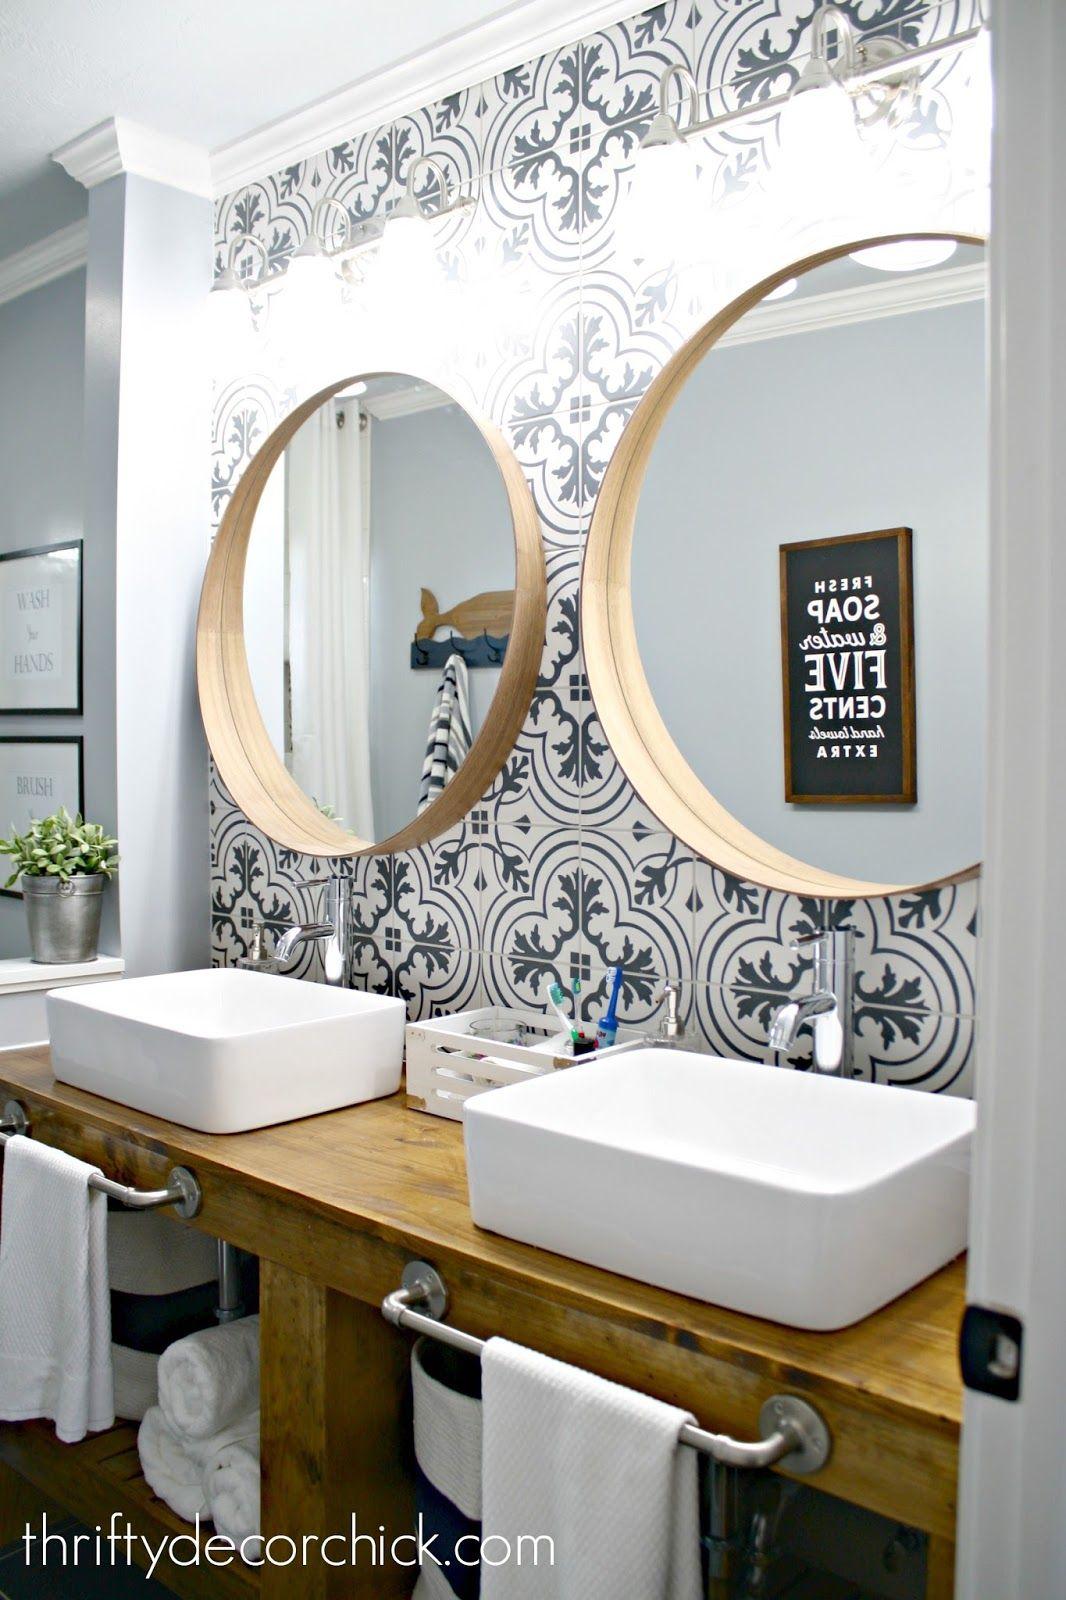 Bathroom makeover with wood vanity vessel sinks